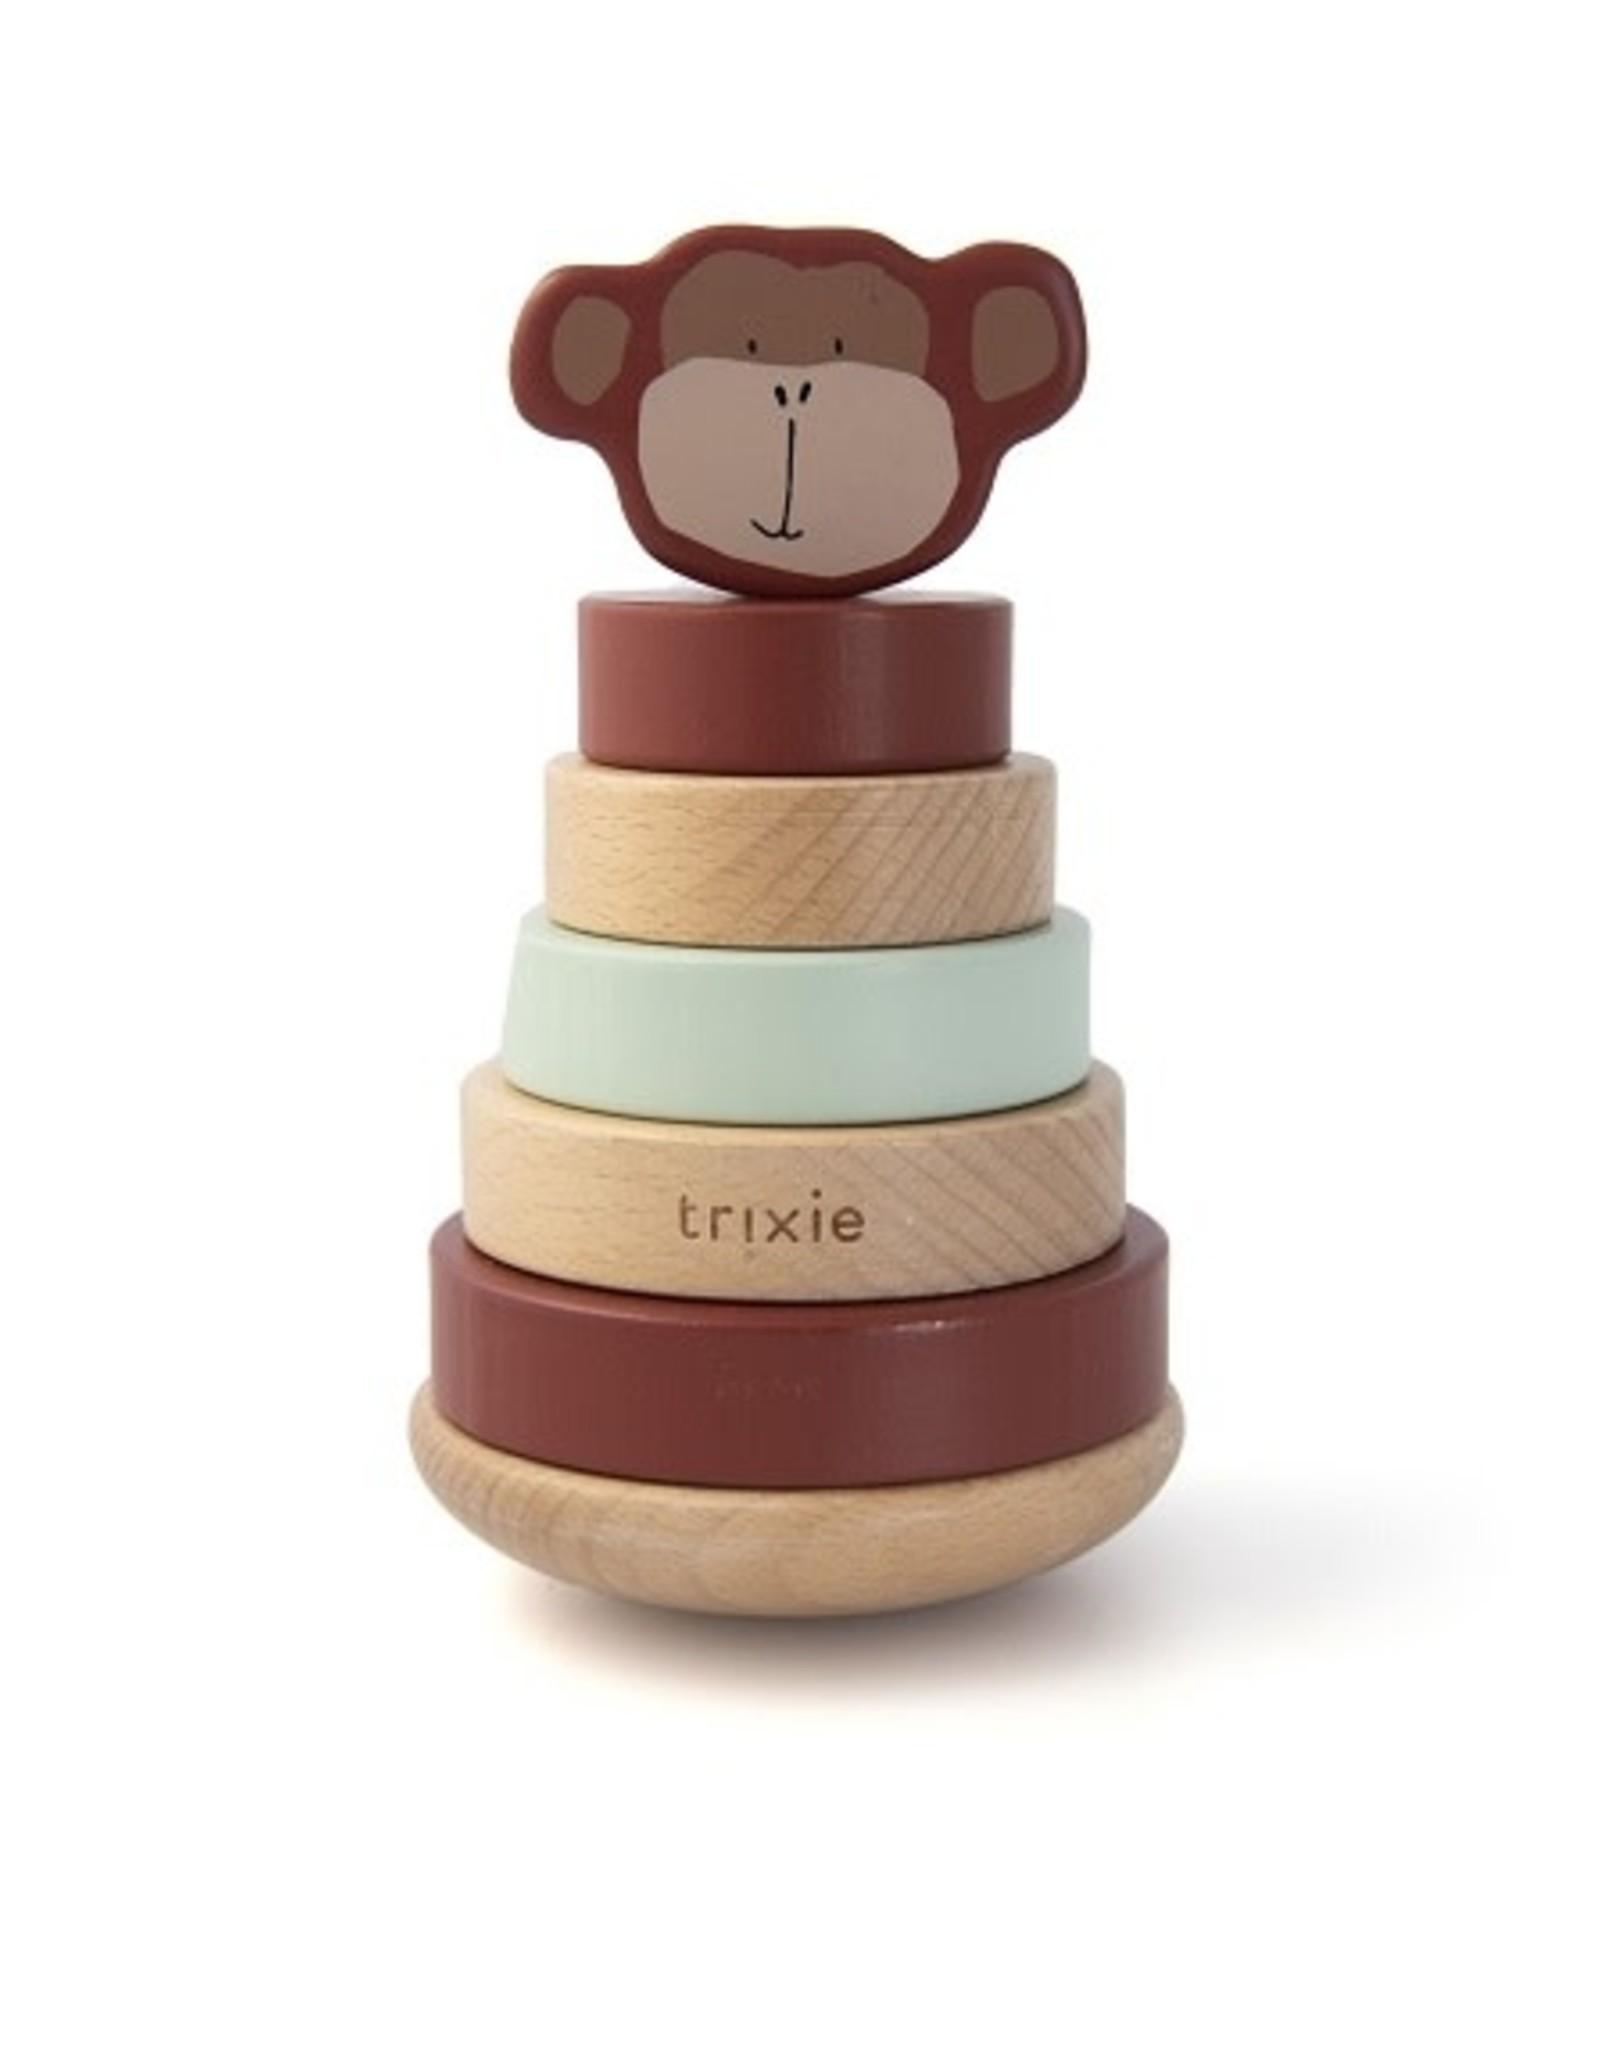 Trixie baby Houten Stapeltoren